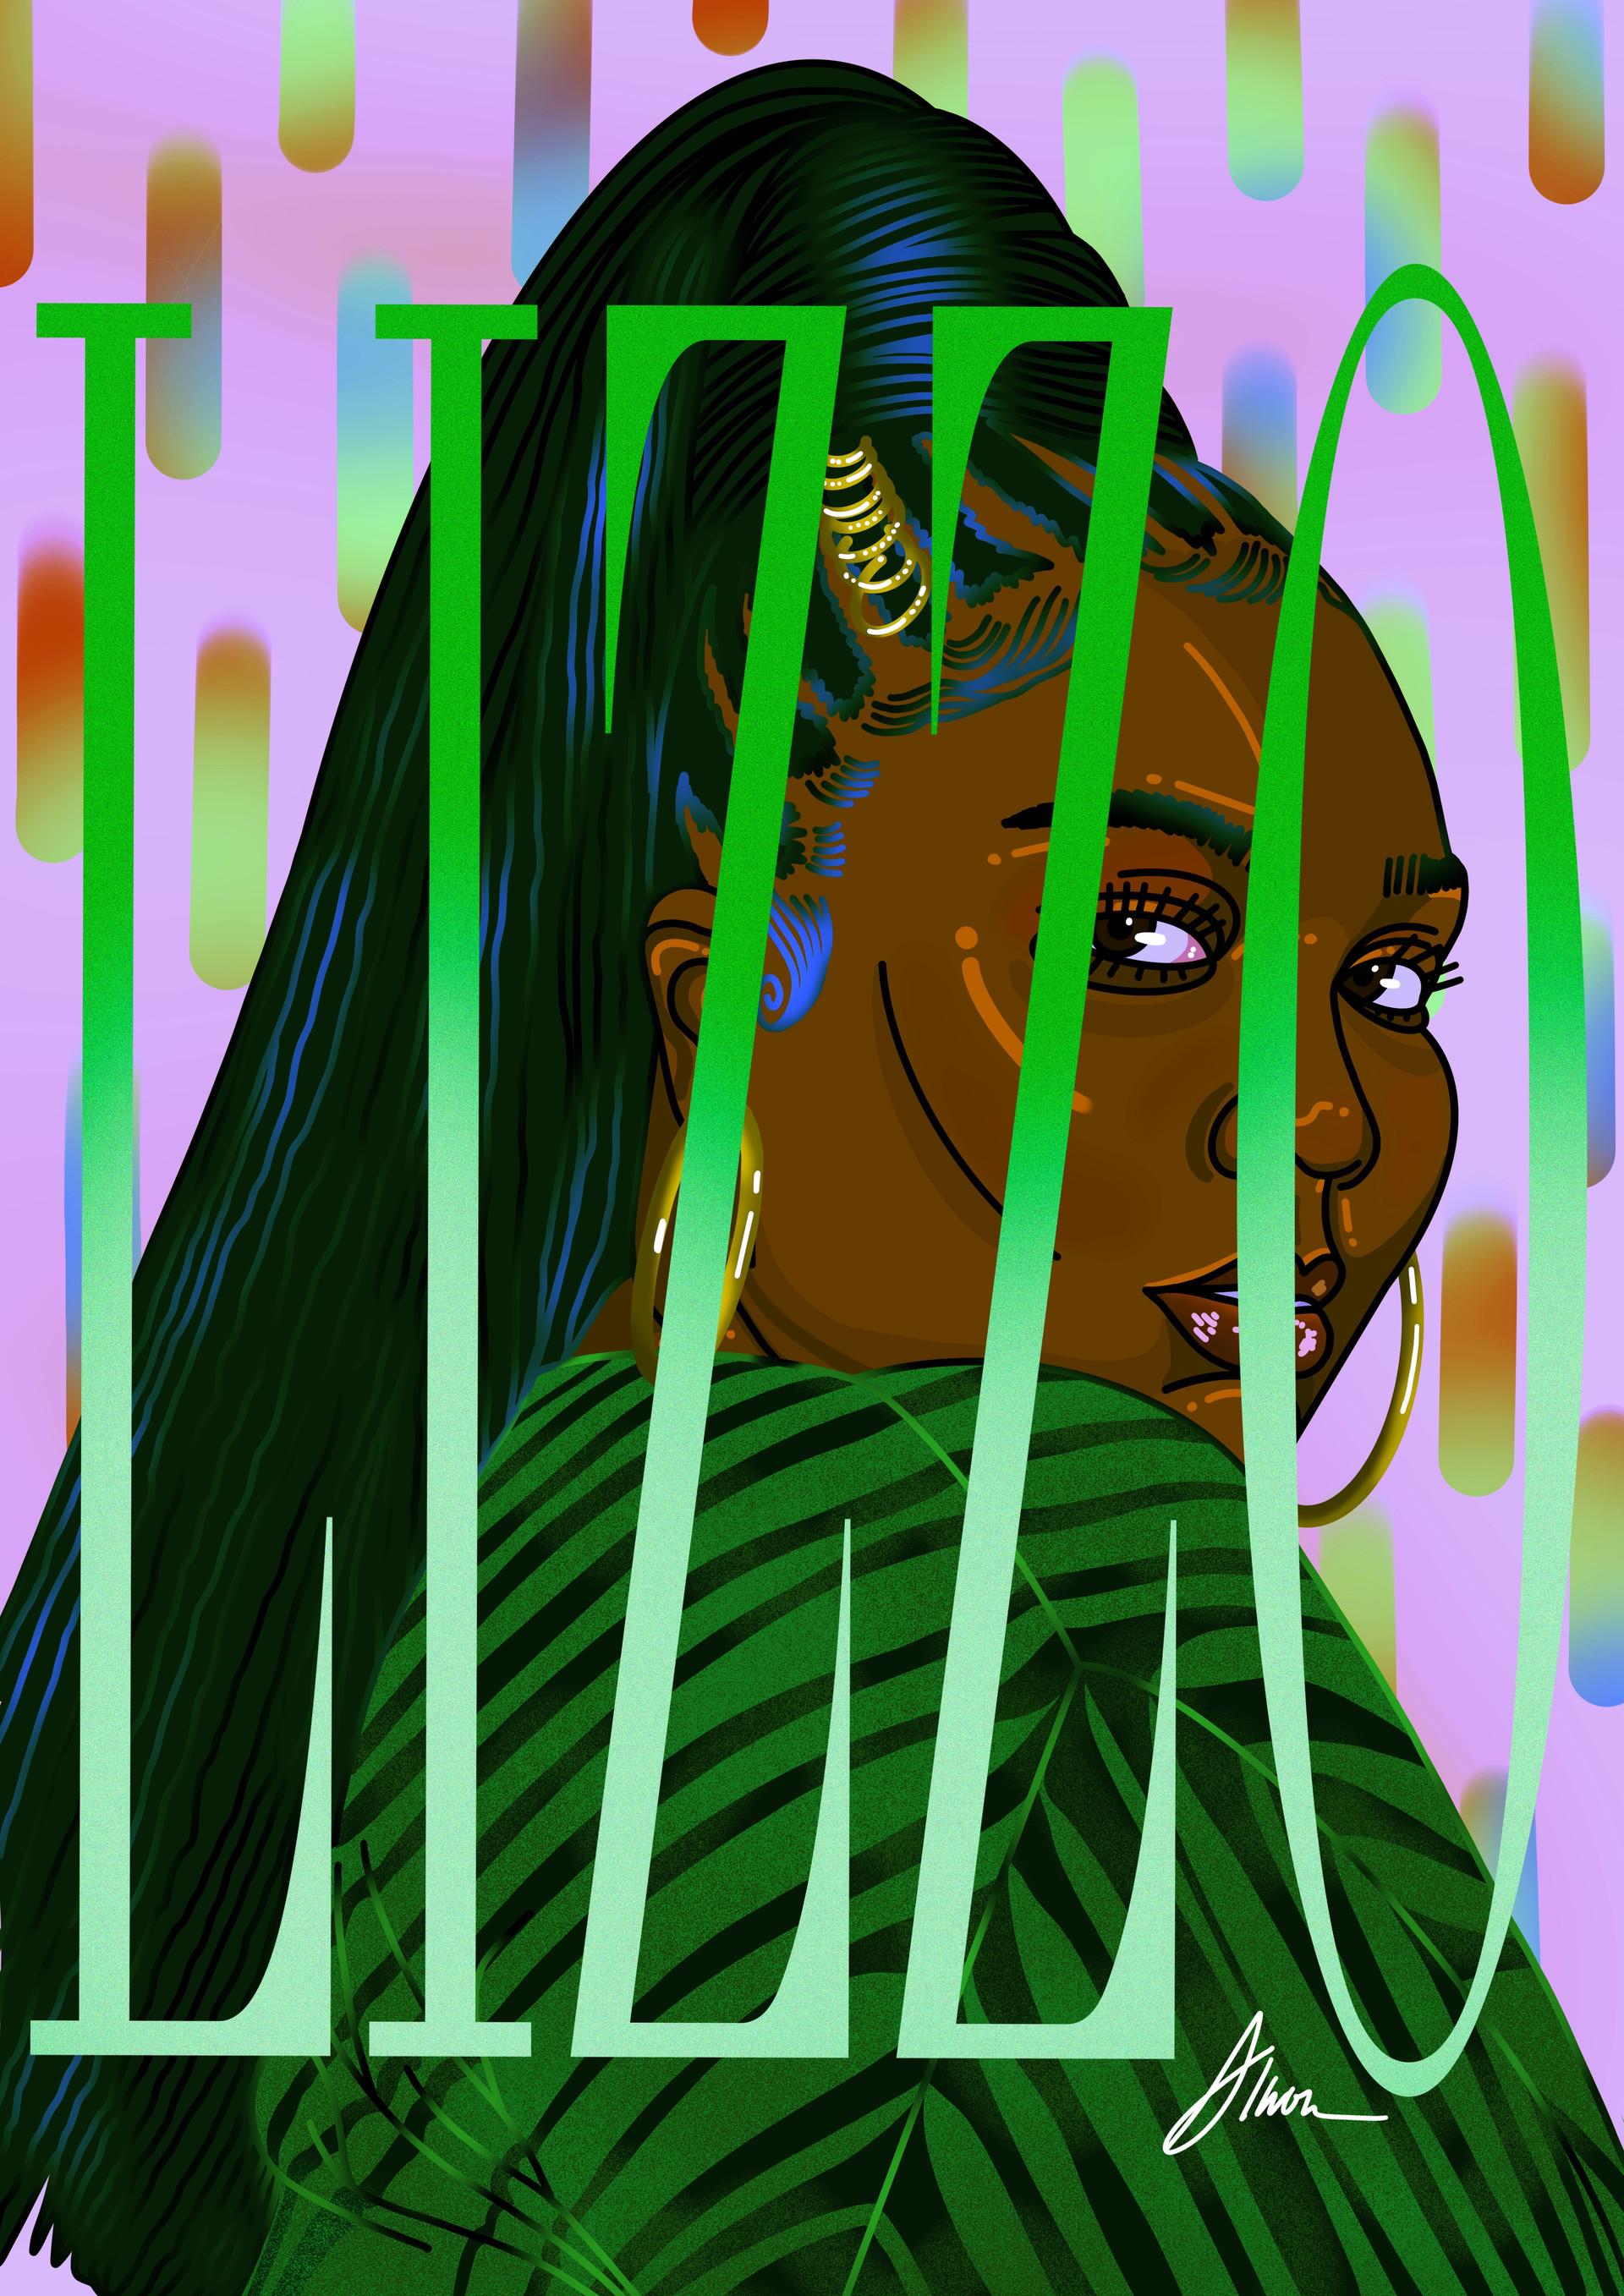 Lizzo illustration